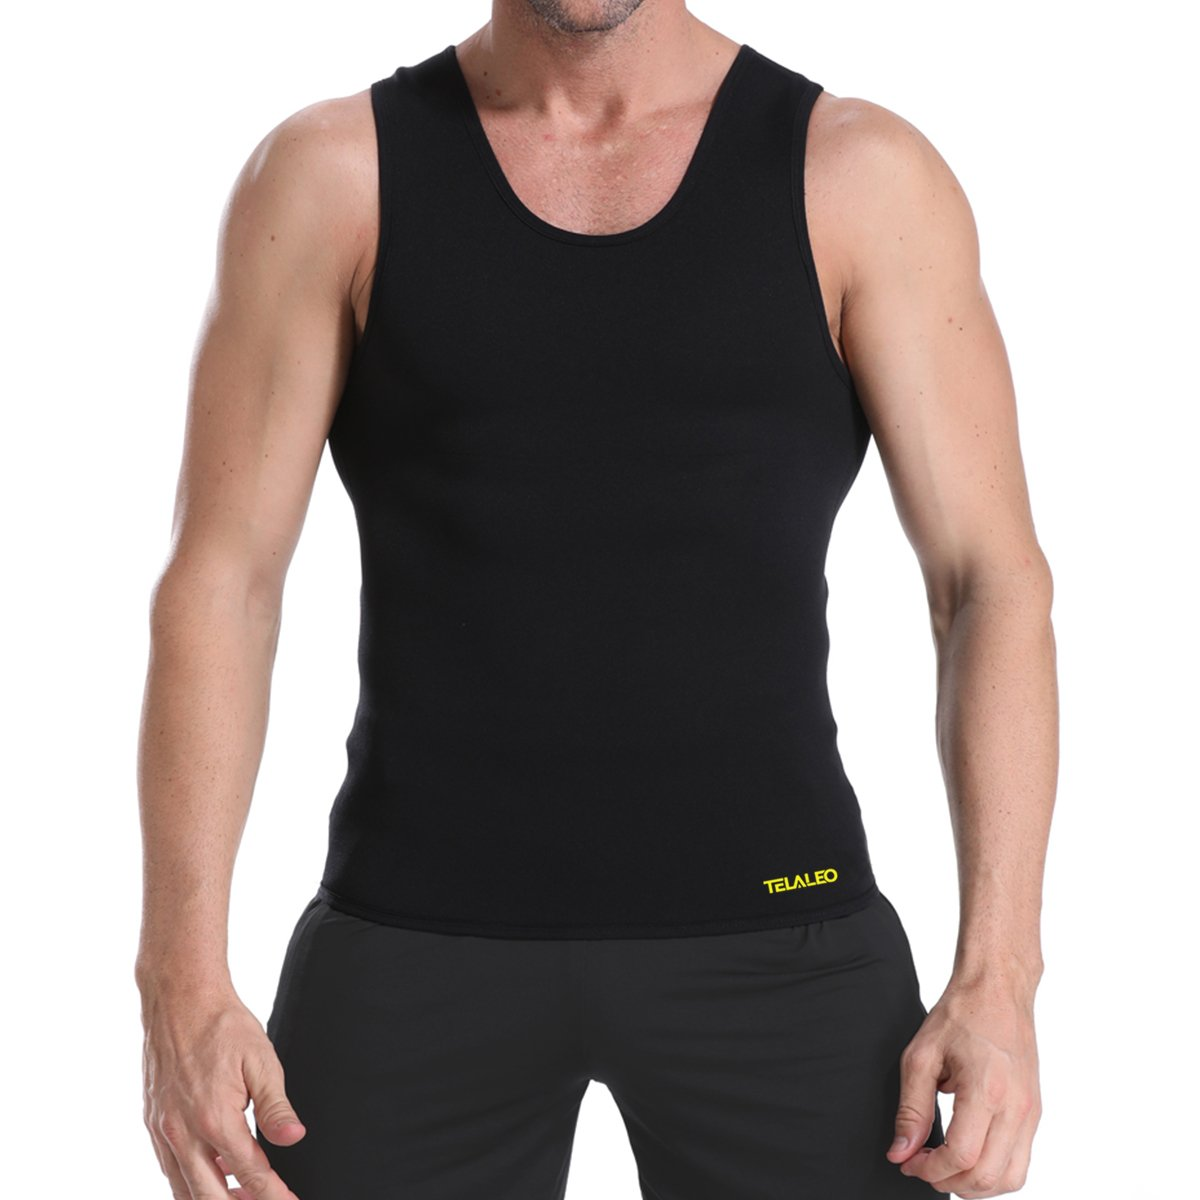 7f2c2cc603a TELALEO Mens Sauna Sweat Vest for Waist Trainer